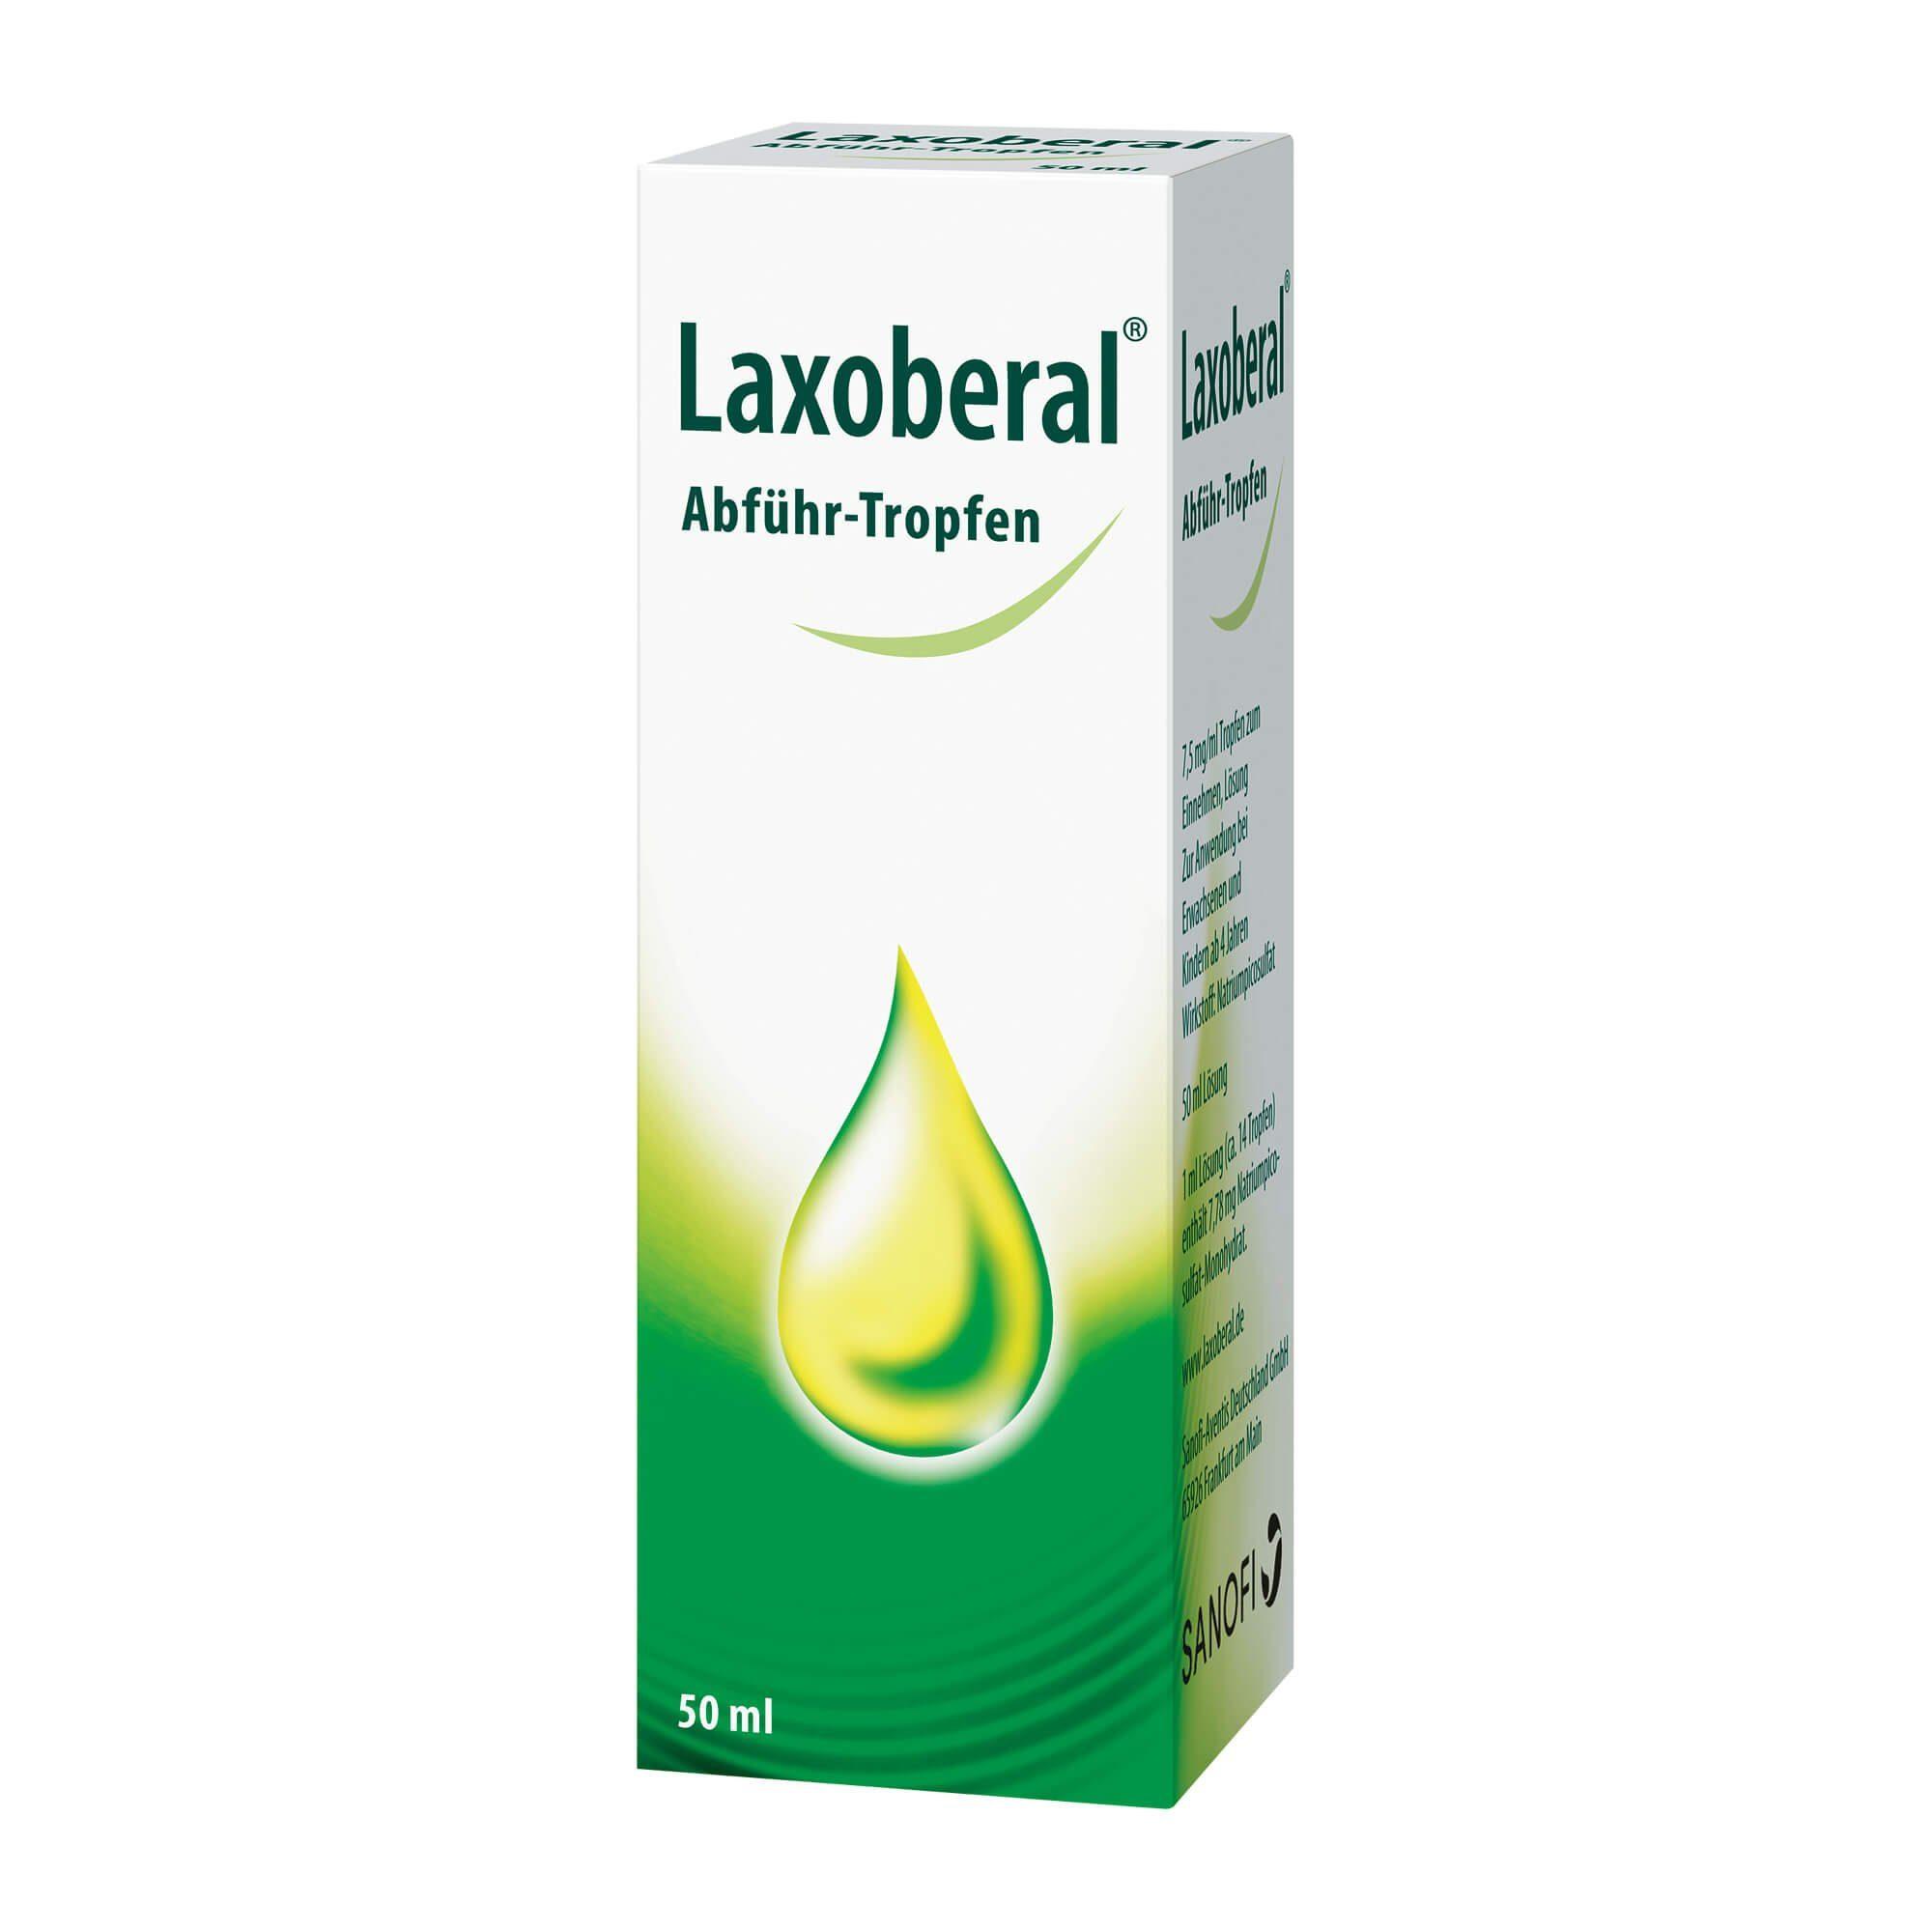 Laxoberal Laxoberal Abführ-Tropfen , 50 ml